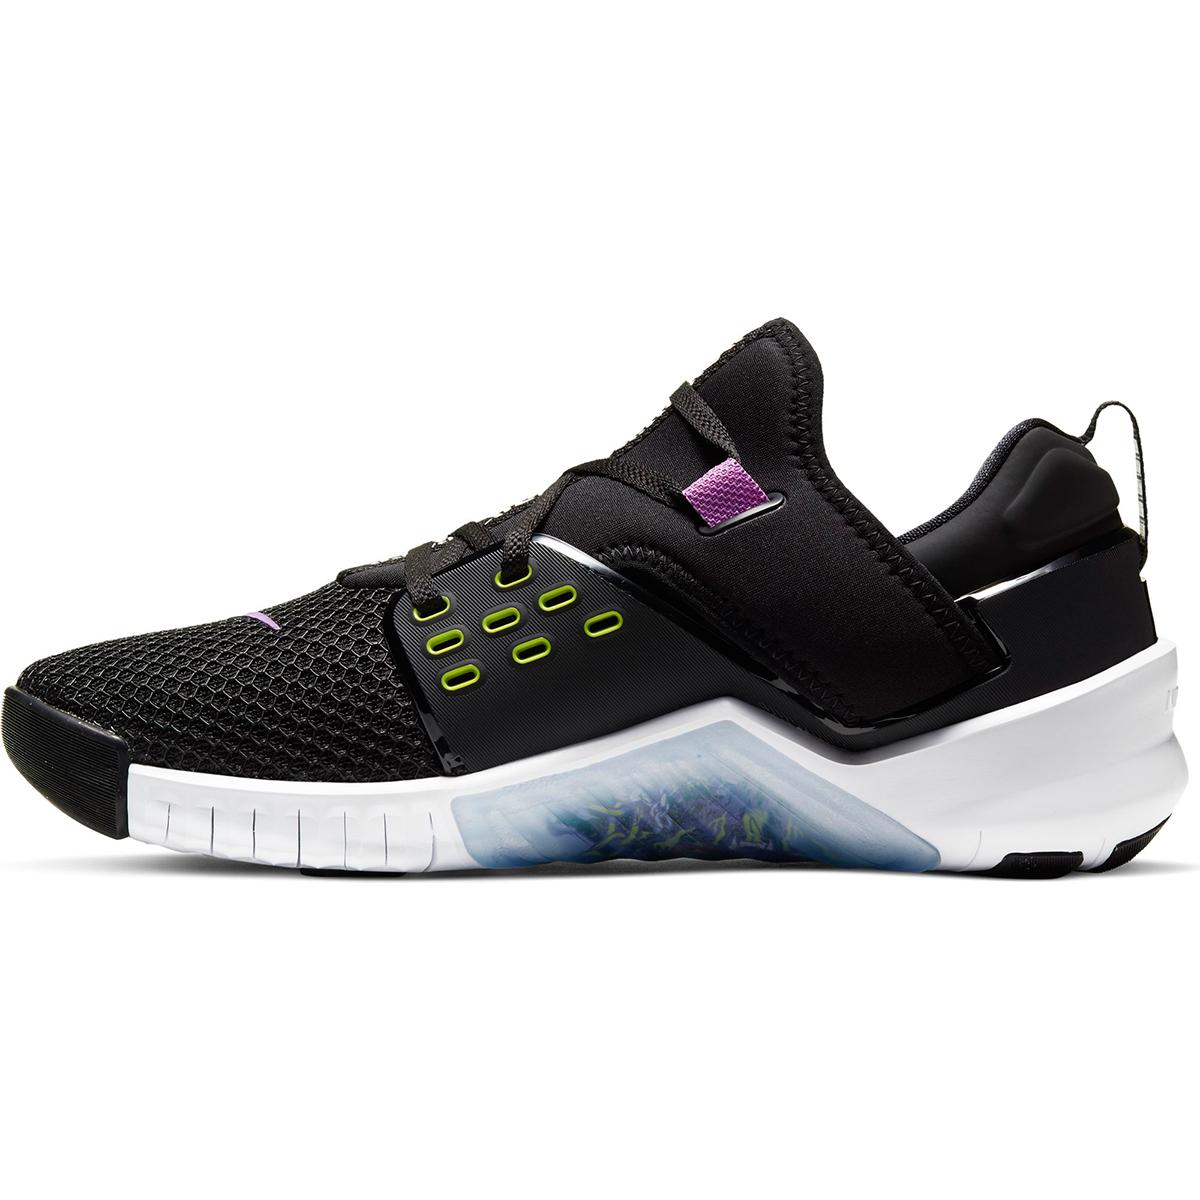 Men's Nike Free X Metcon 2 Training Shoes - Color: Black/Purple Nebula/White/Bright (Regular Width) - Size: 6, Black/Purple Nebula/White/Bright, large, image 2